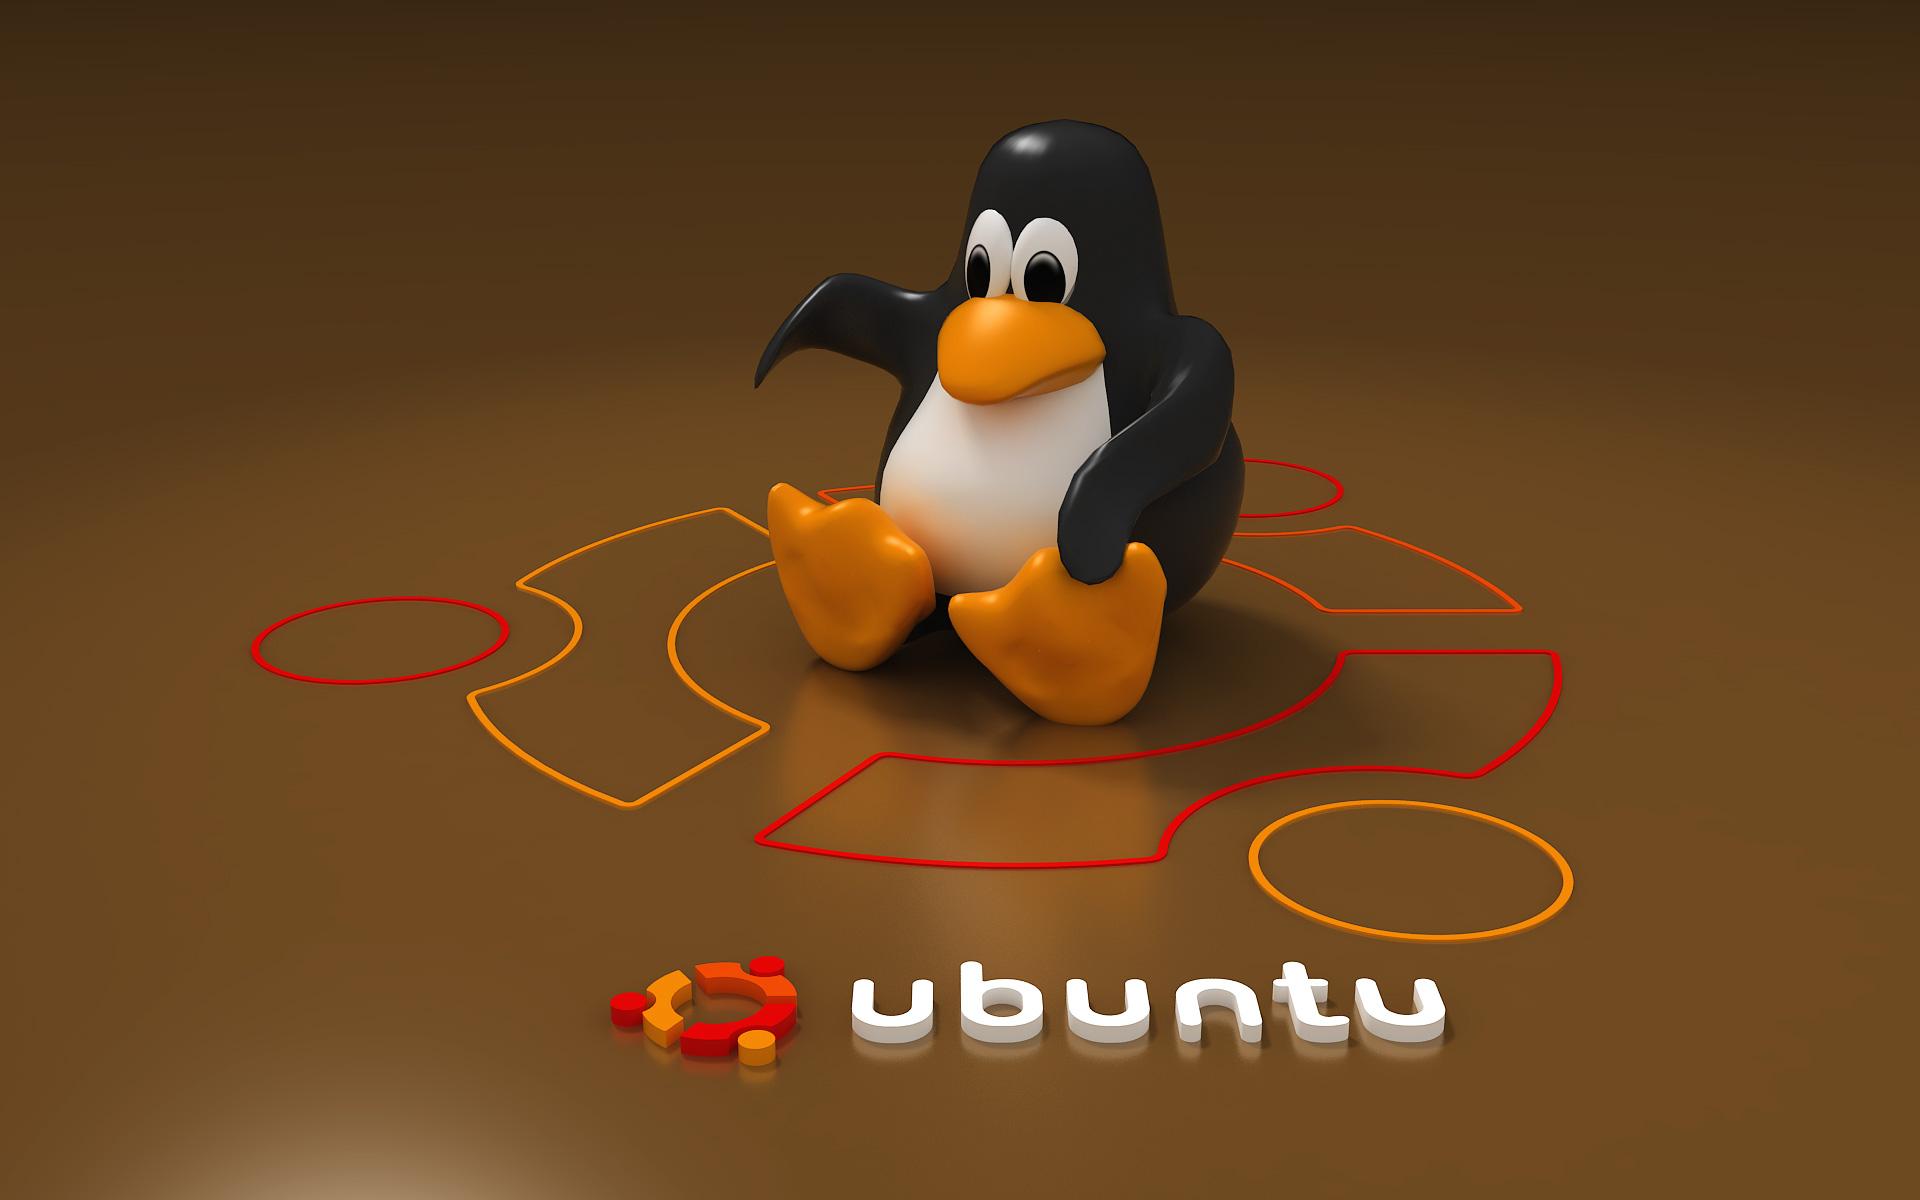 ubuntu ��������!